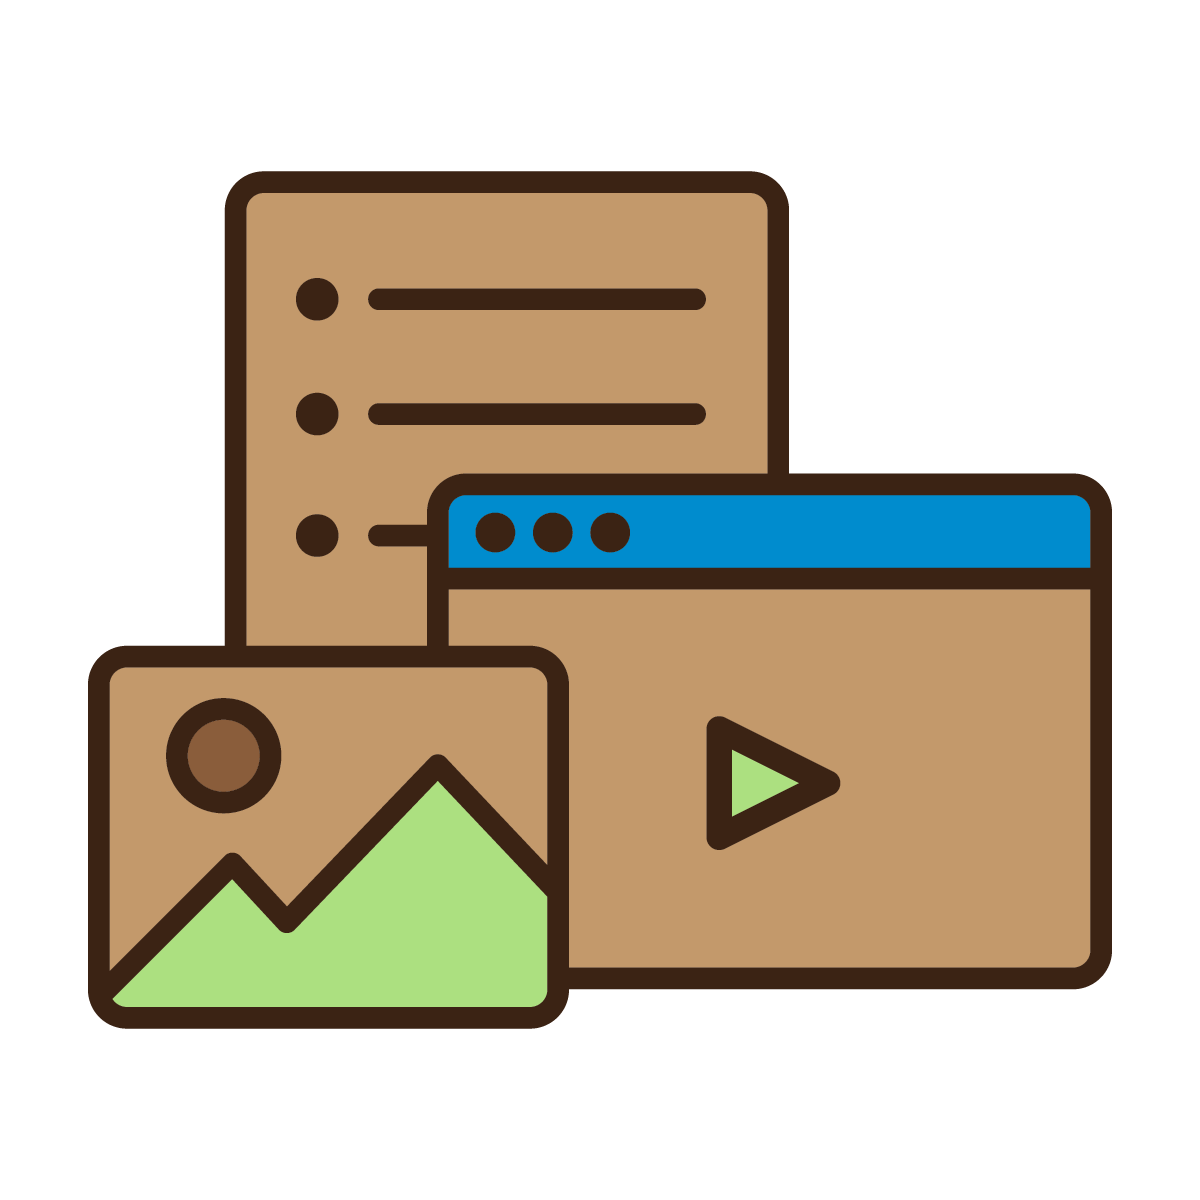 Brave resources icon